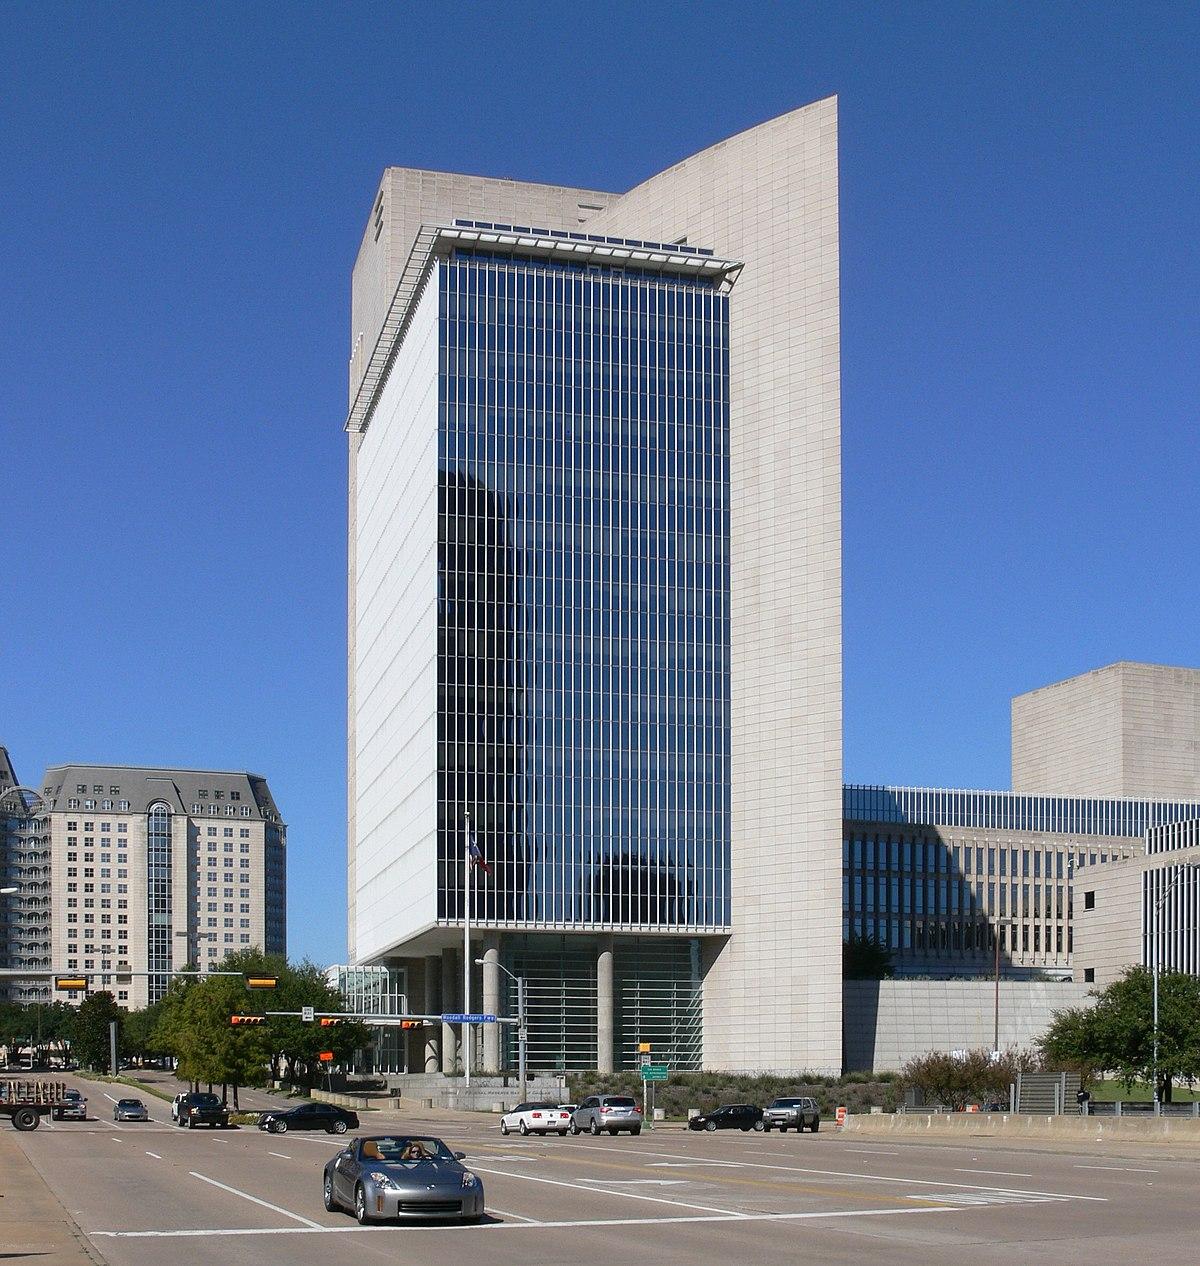 Charmful Dallas 1 United Central Bank Houston Tx Central Bank Houston Cd Rates 1200px Federal Reserve Bank houzz-03 Central Bank Houston